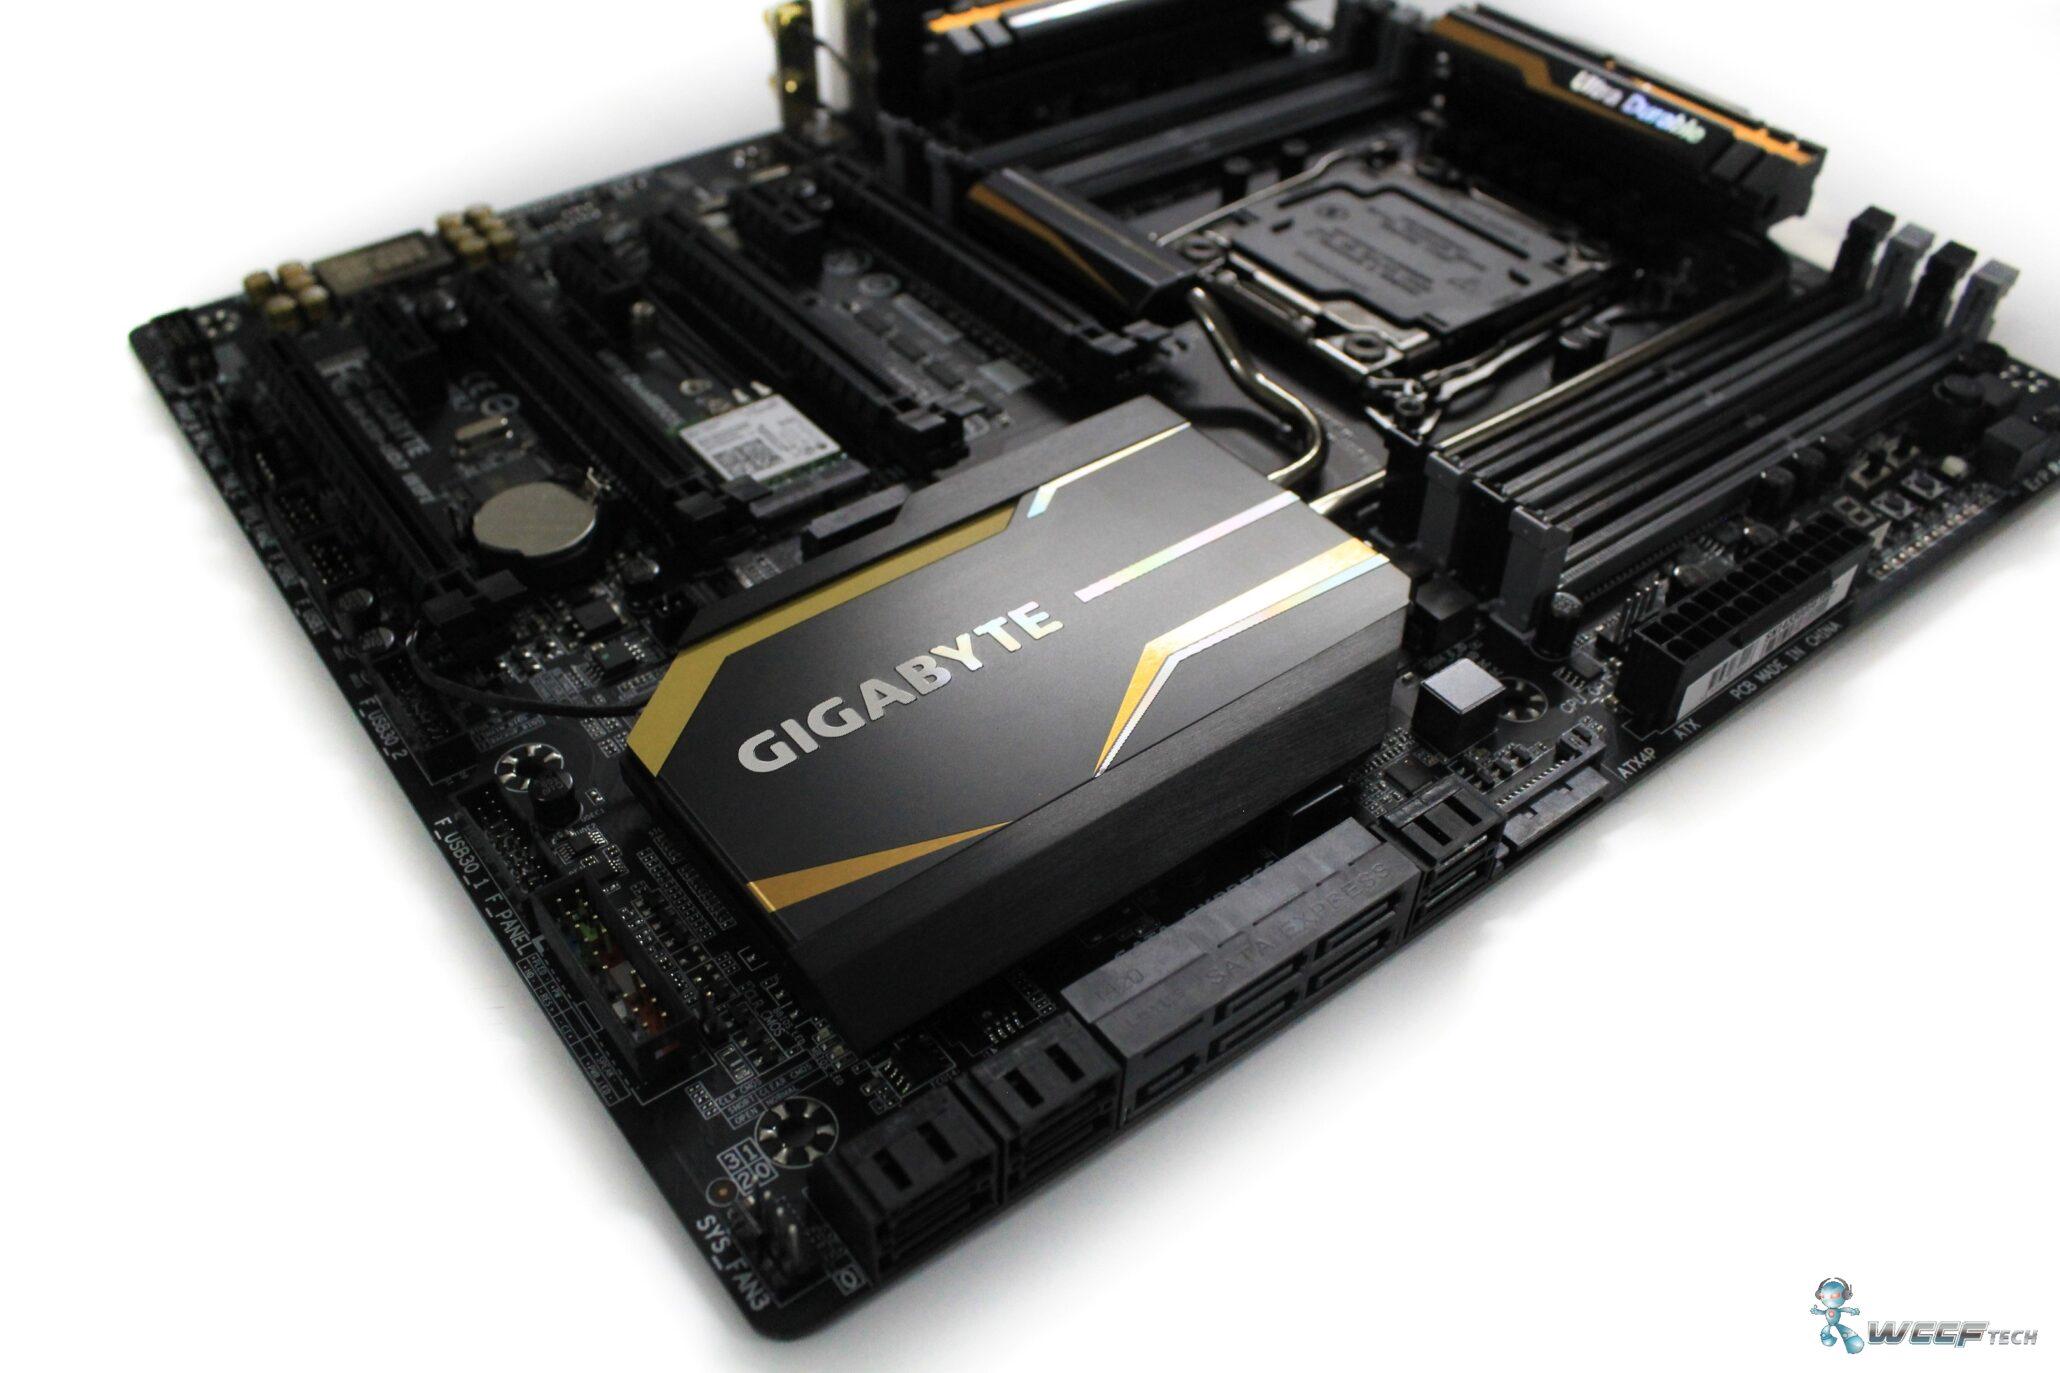 gigabyte-x99-ud7-wifi_side-view-1